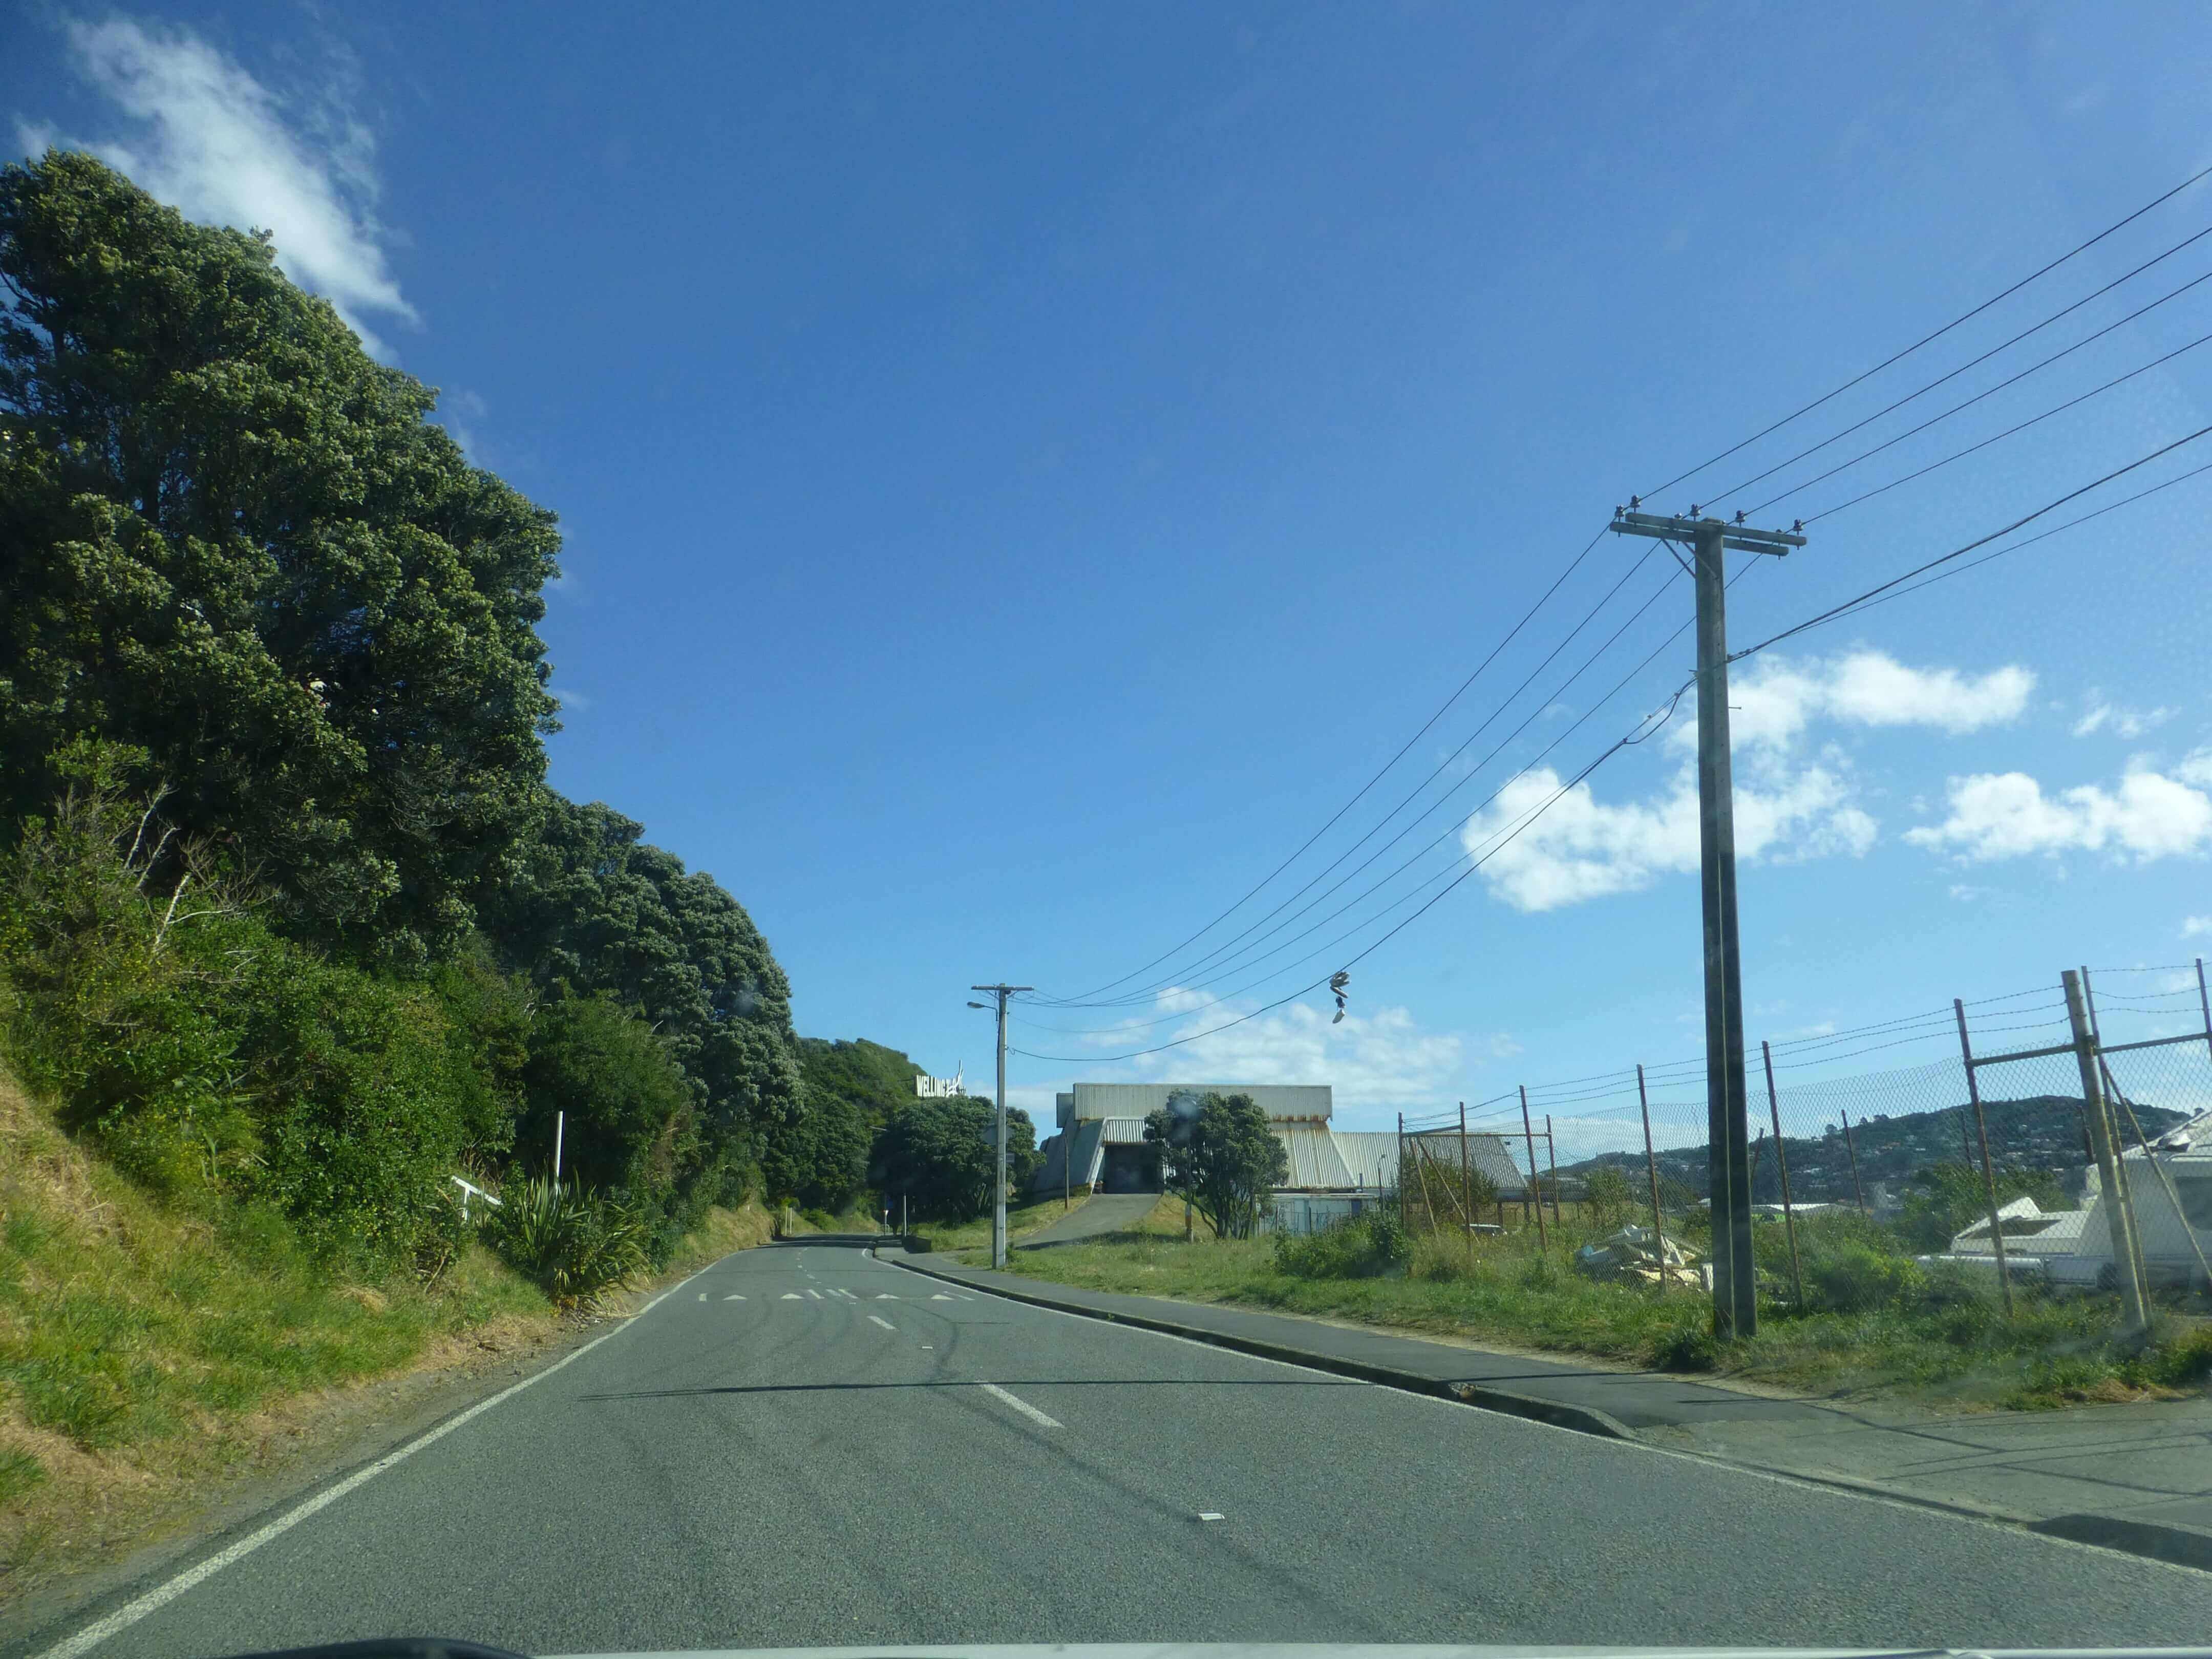 Wellington, in Miramar auf dem Weg zum Weta Shop, Weit-weg.reisen 8